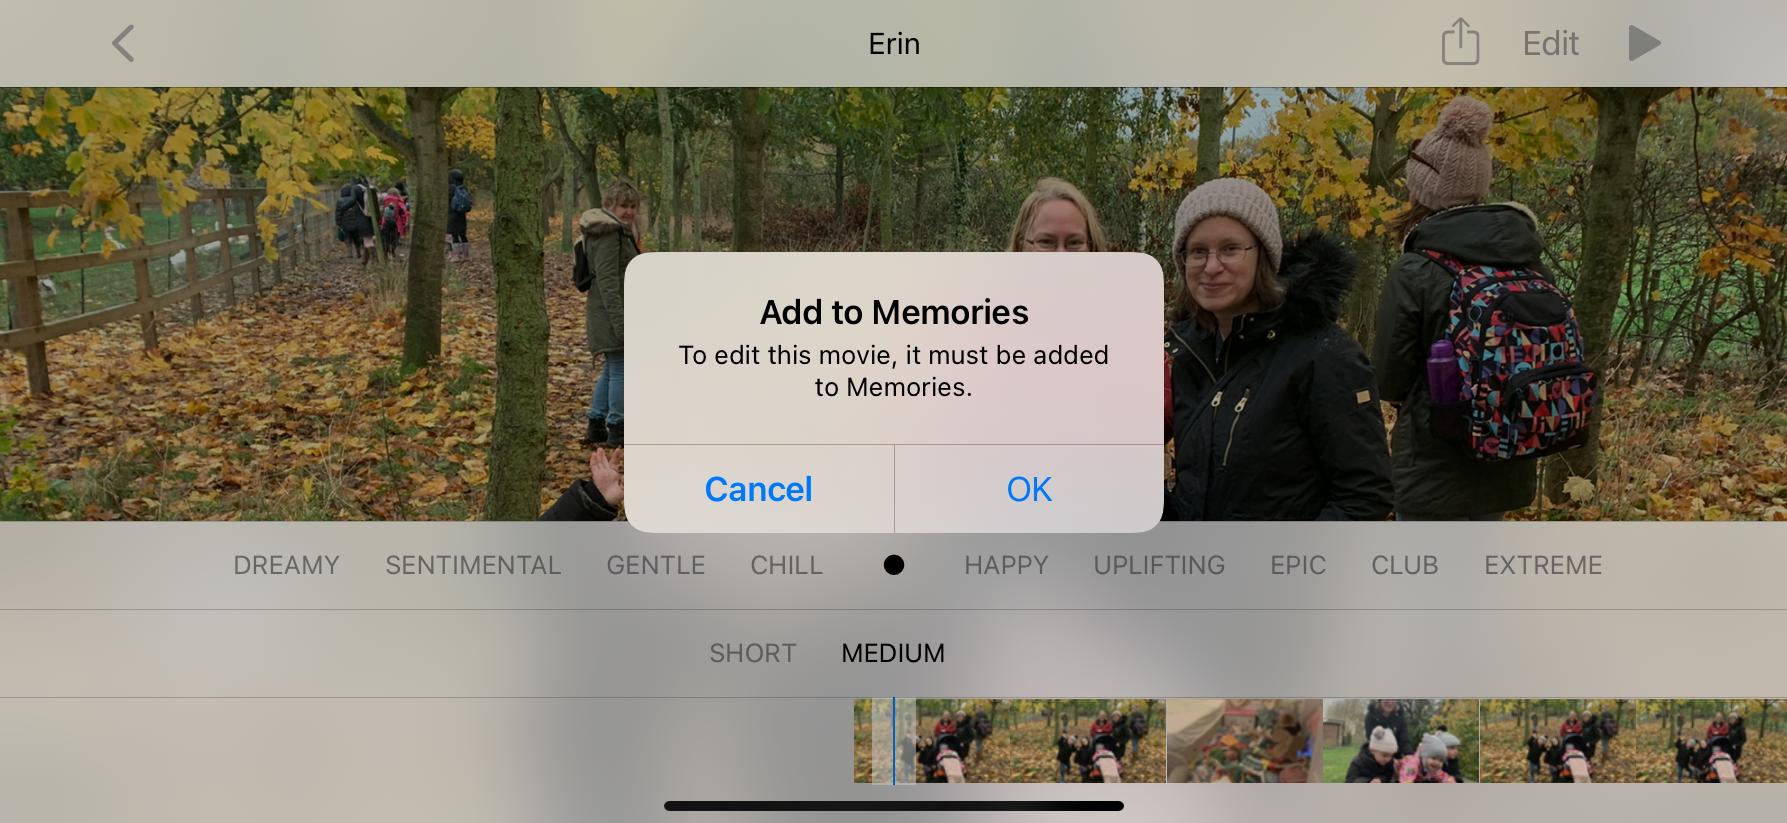 Add Memory